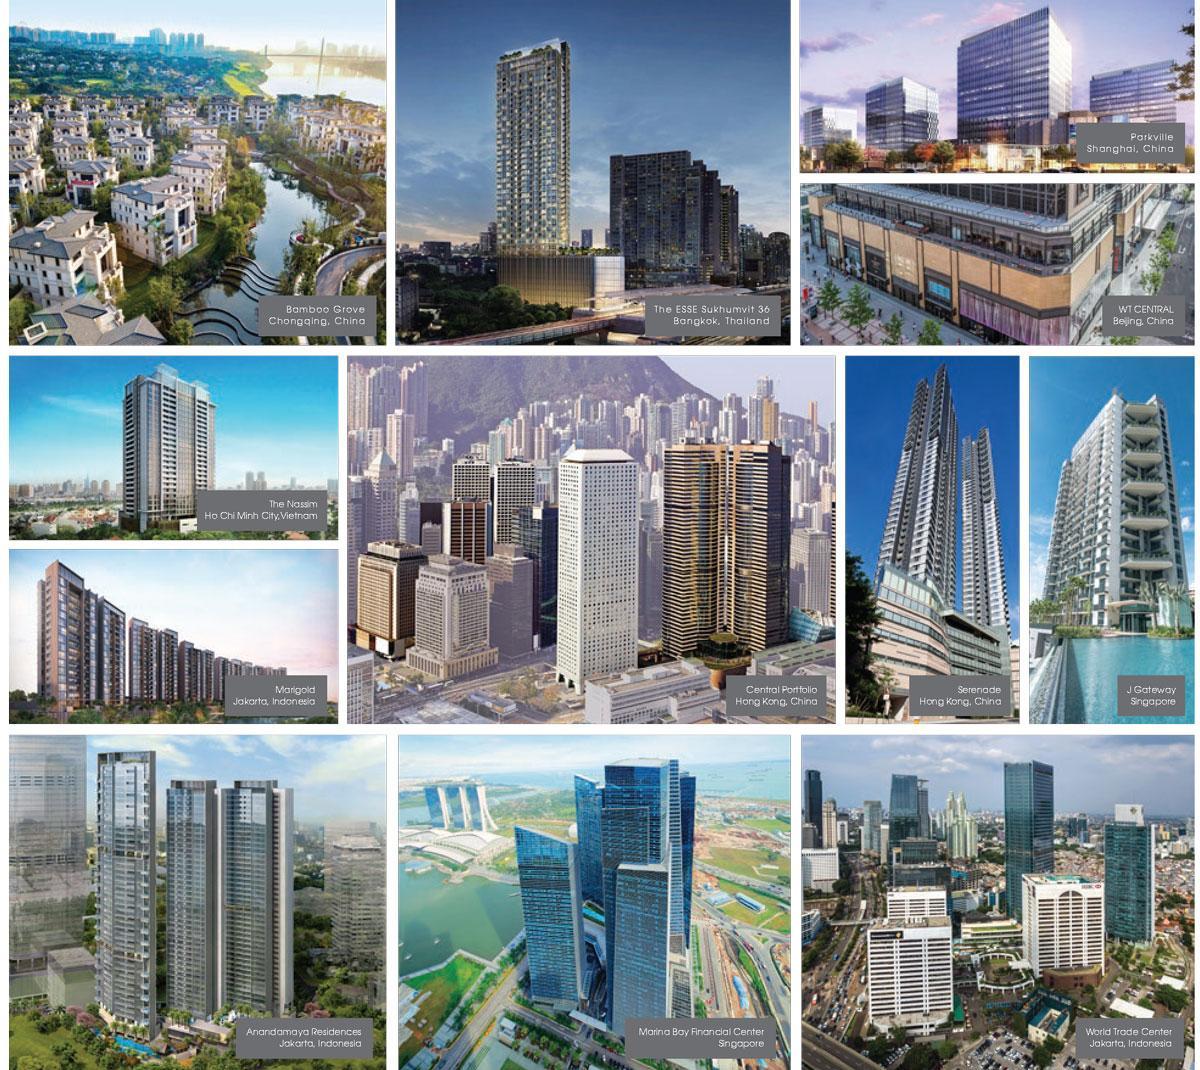 hongkongland-gioithieu.jpg